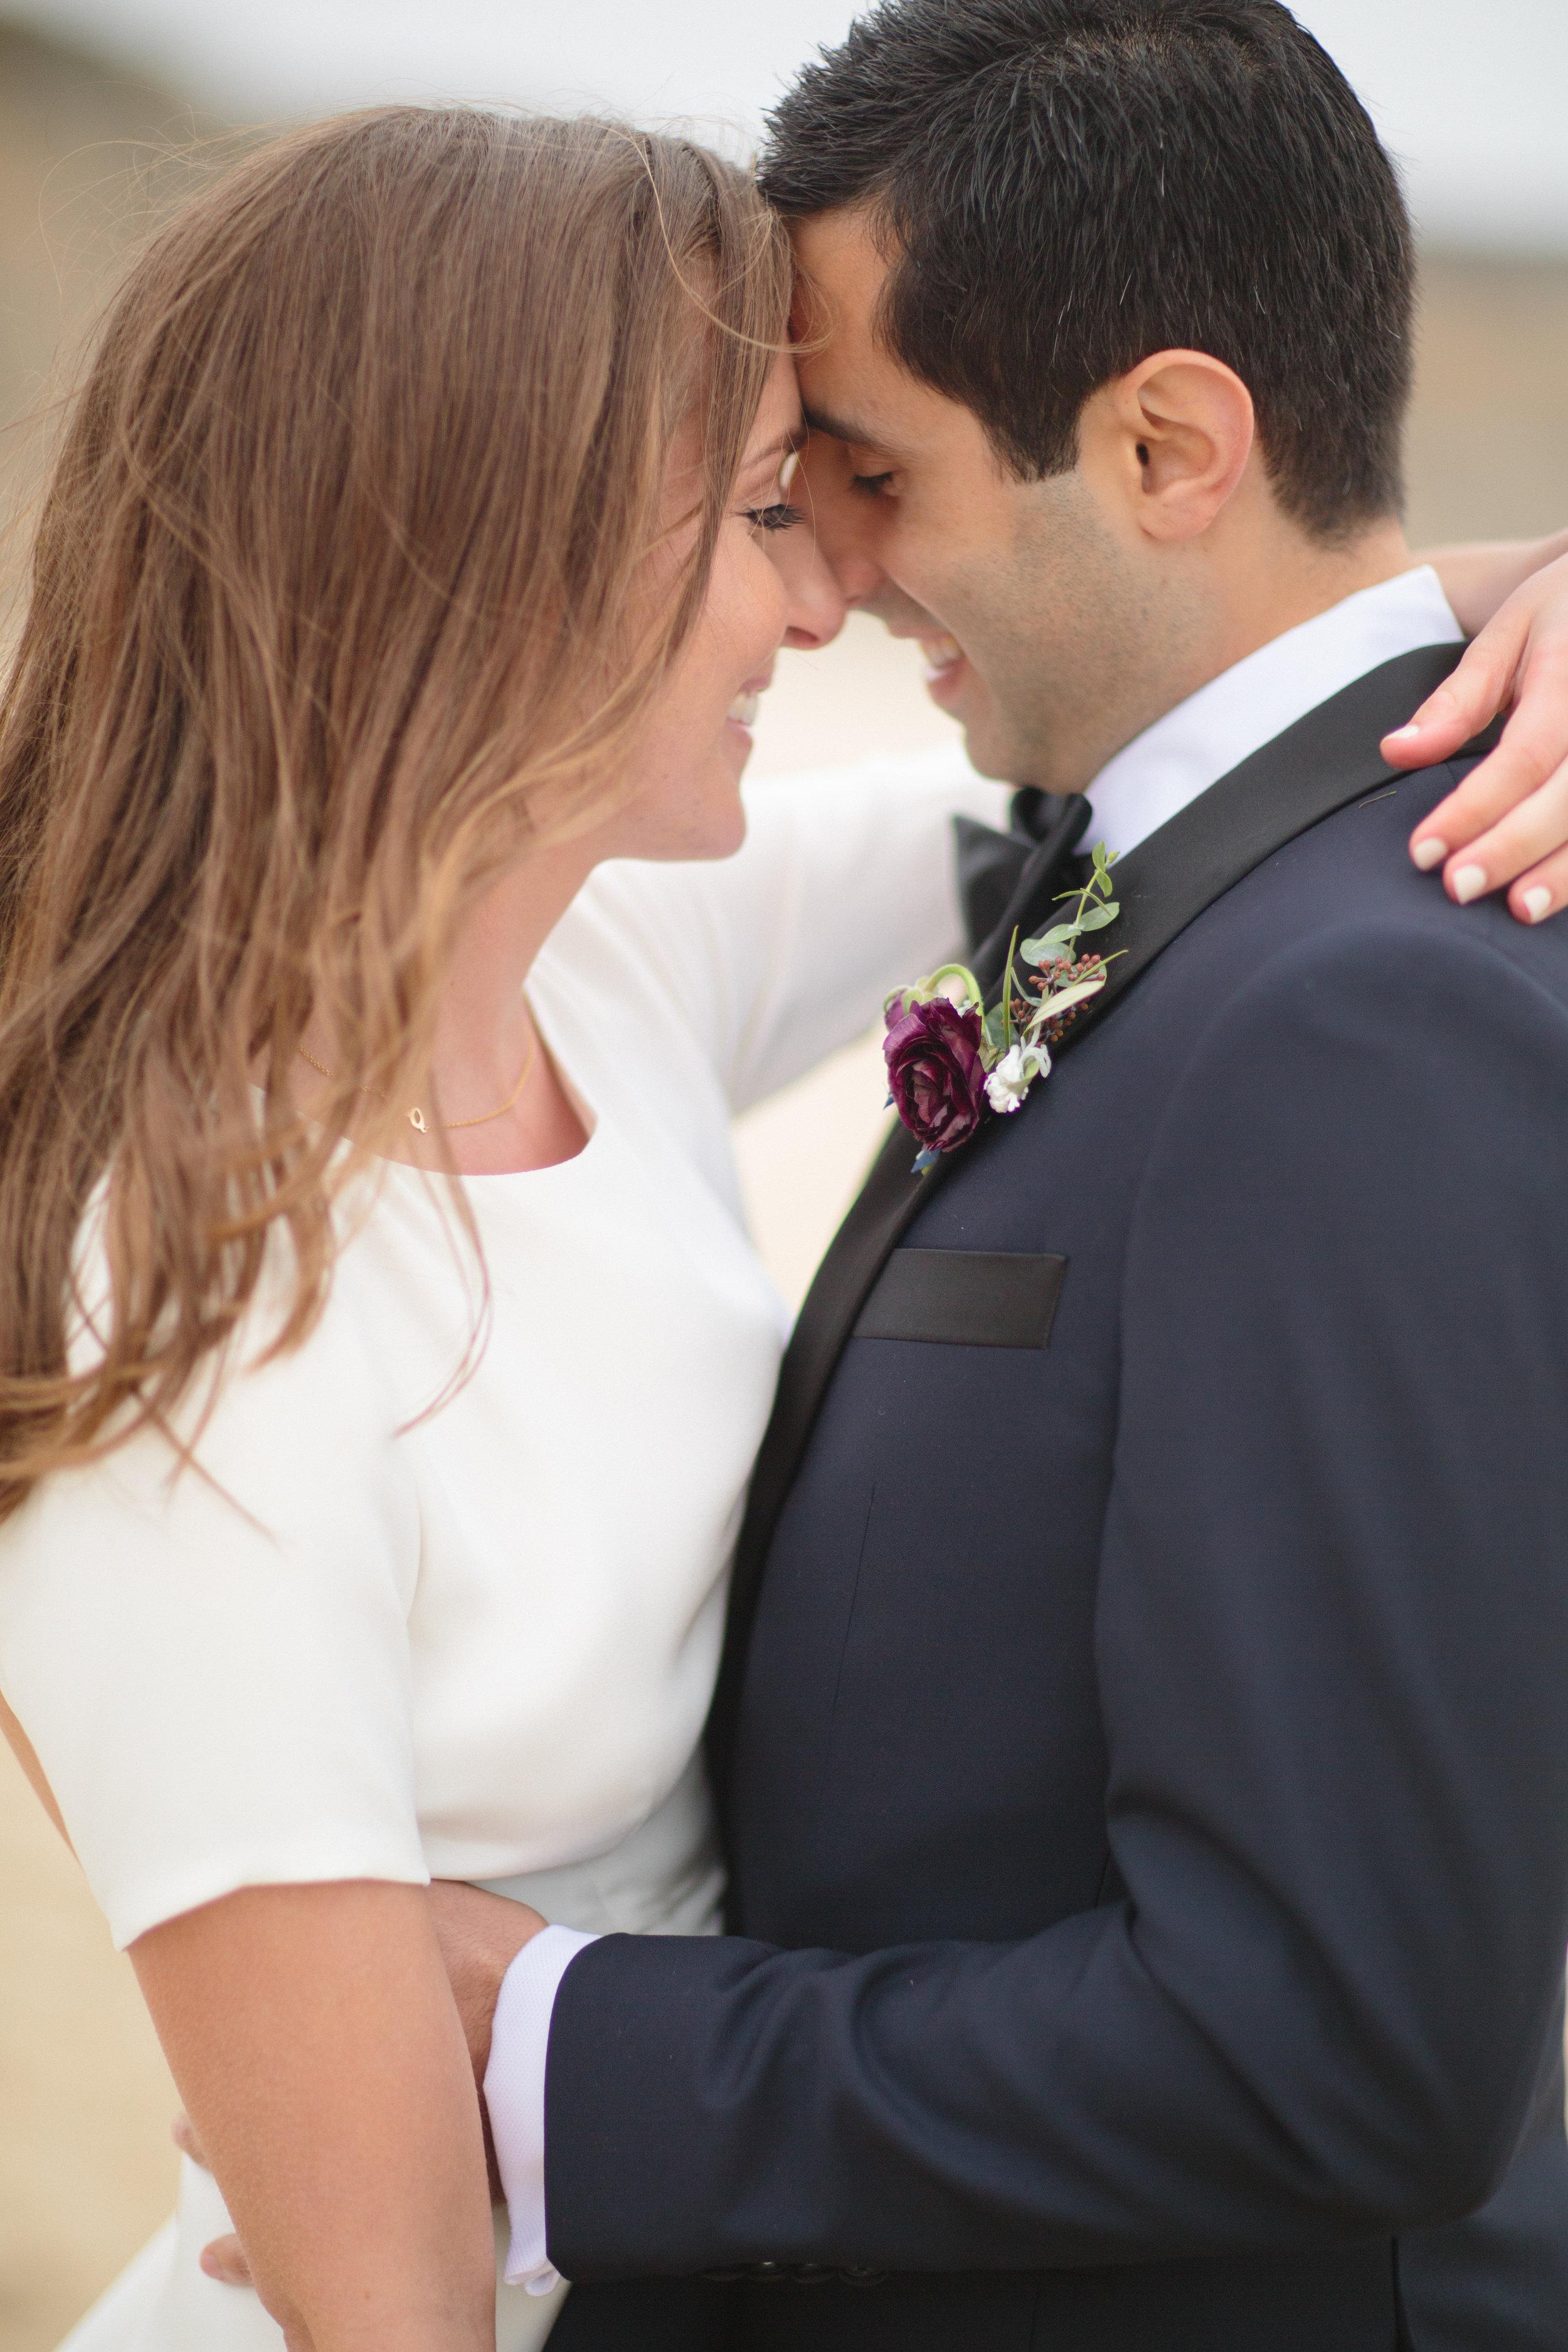 larissa-cleveland-sivanjeremy-wedding-0845-2.jpg